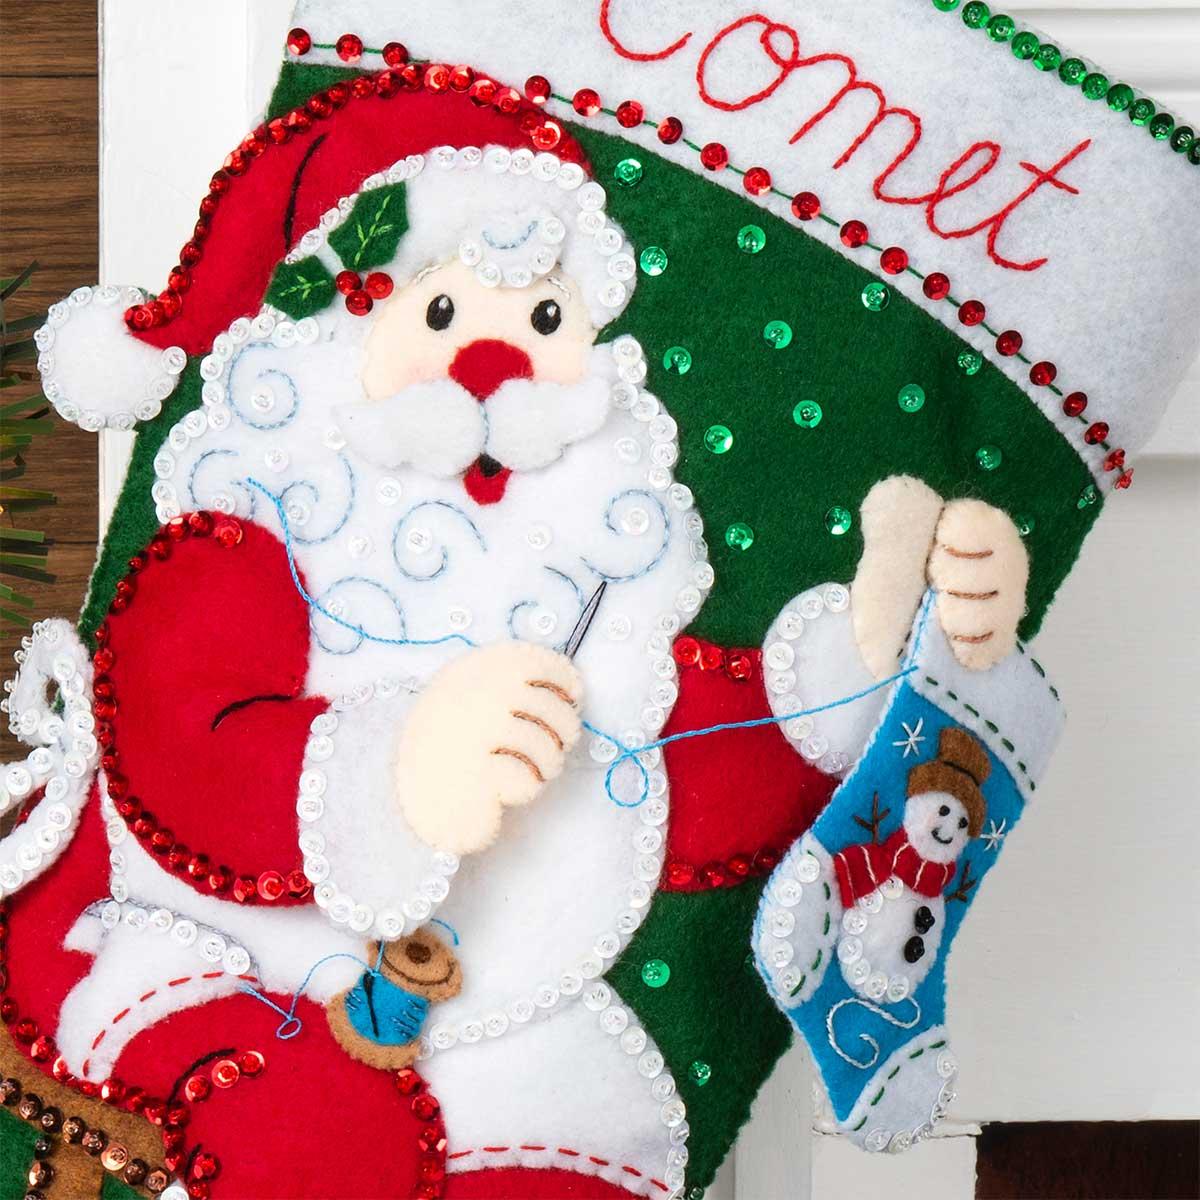 Bucilla ® Seasonal - Felt - Stocking Kits - Stitching Santa - 89234E